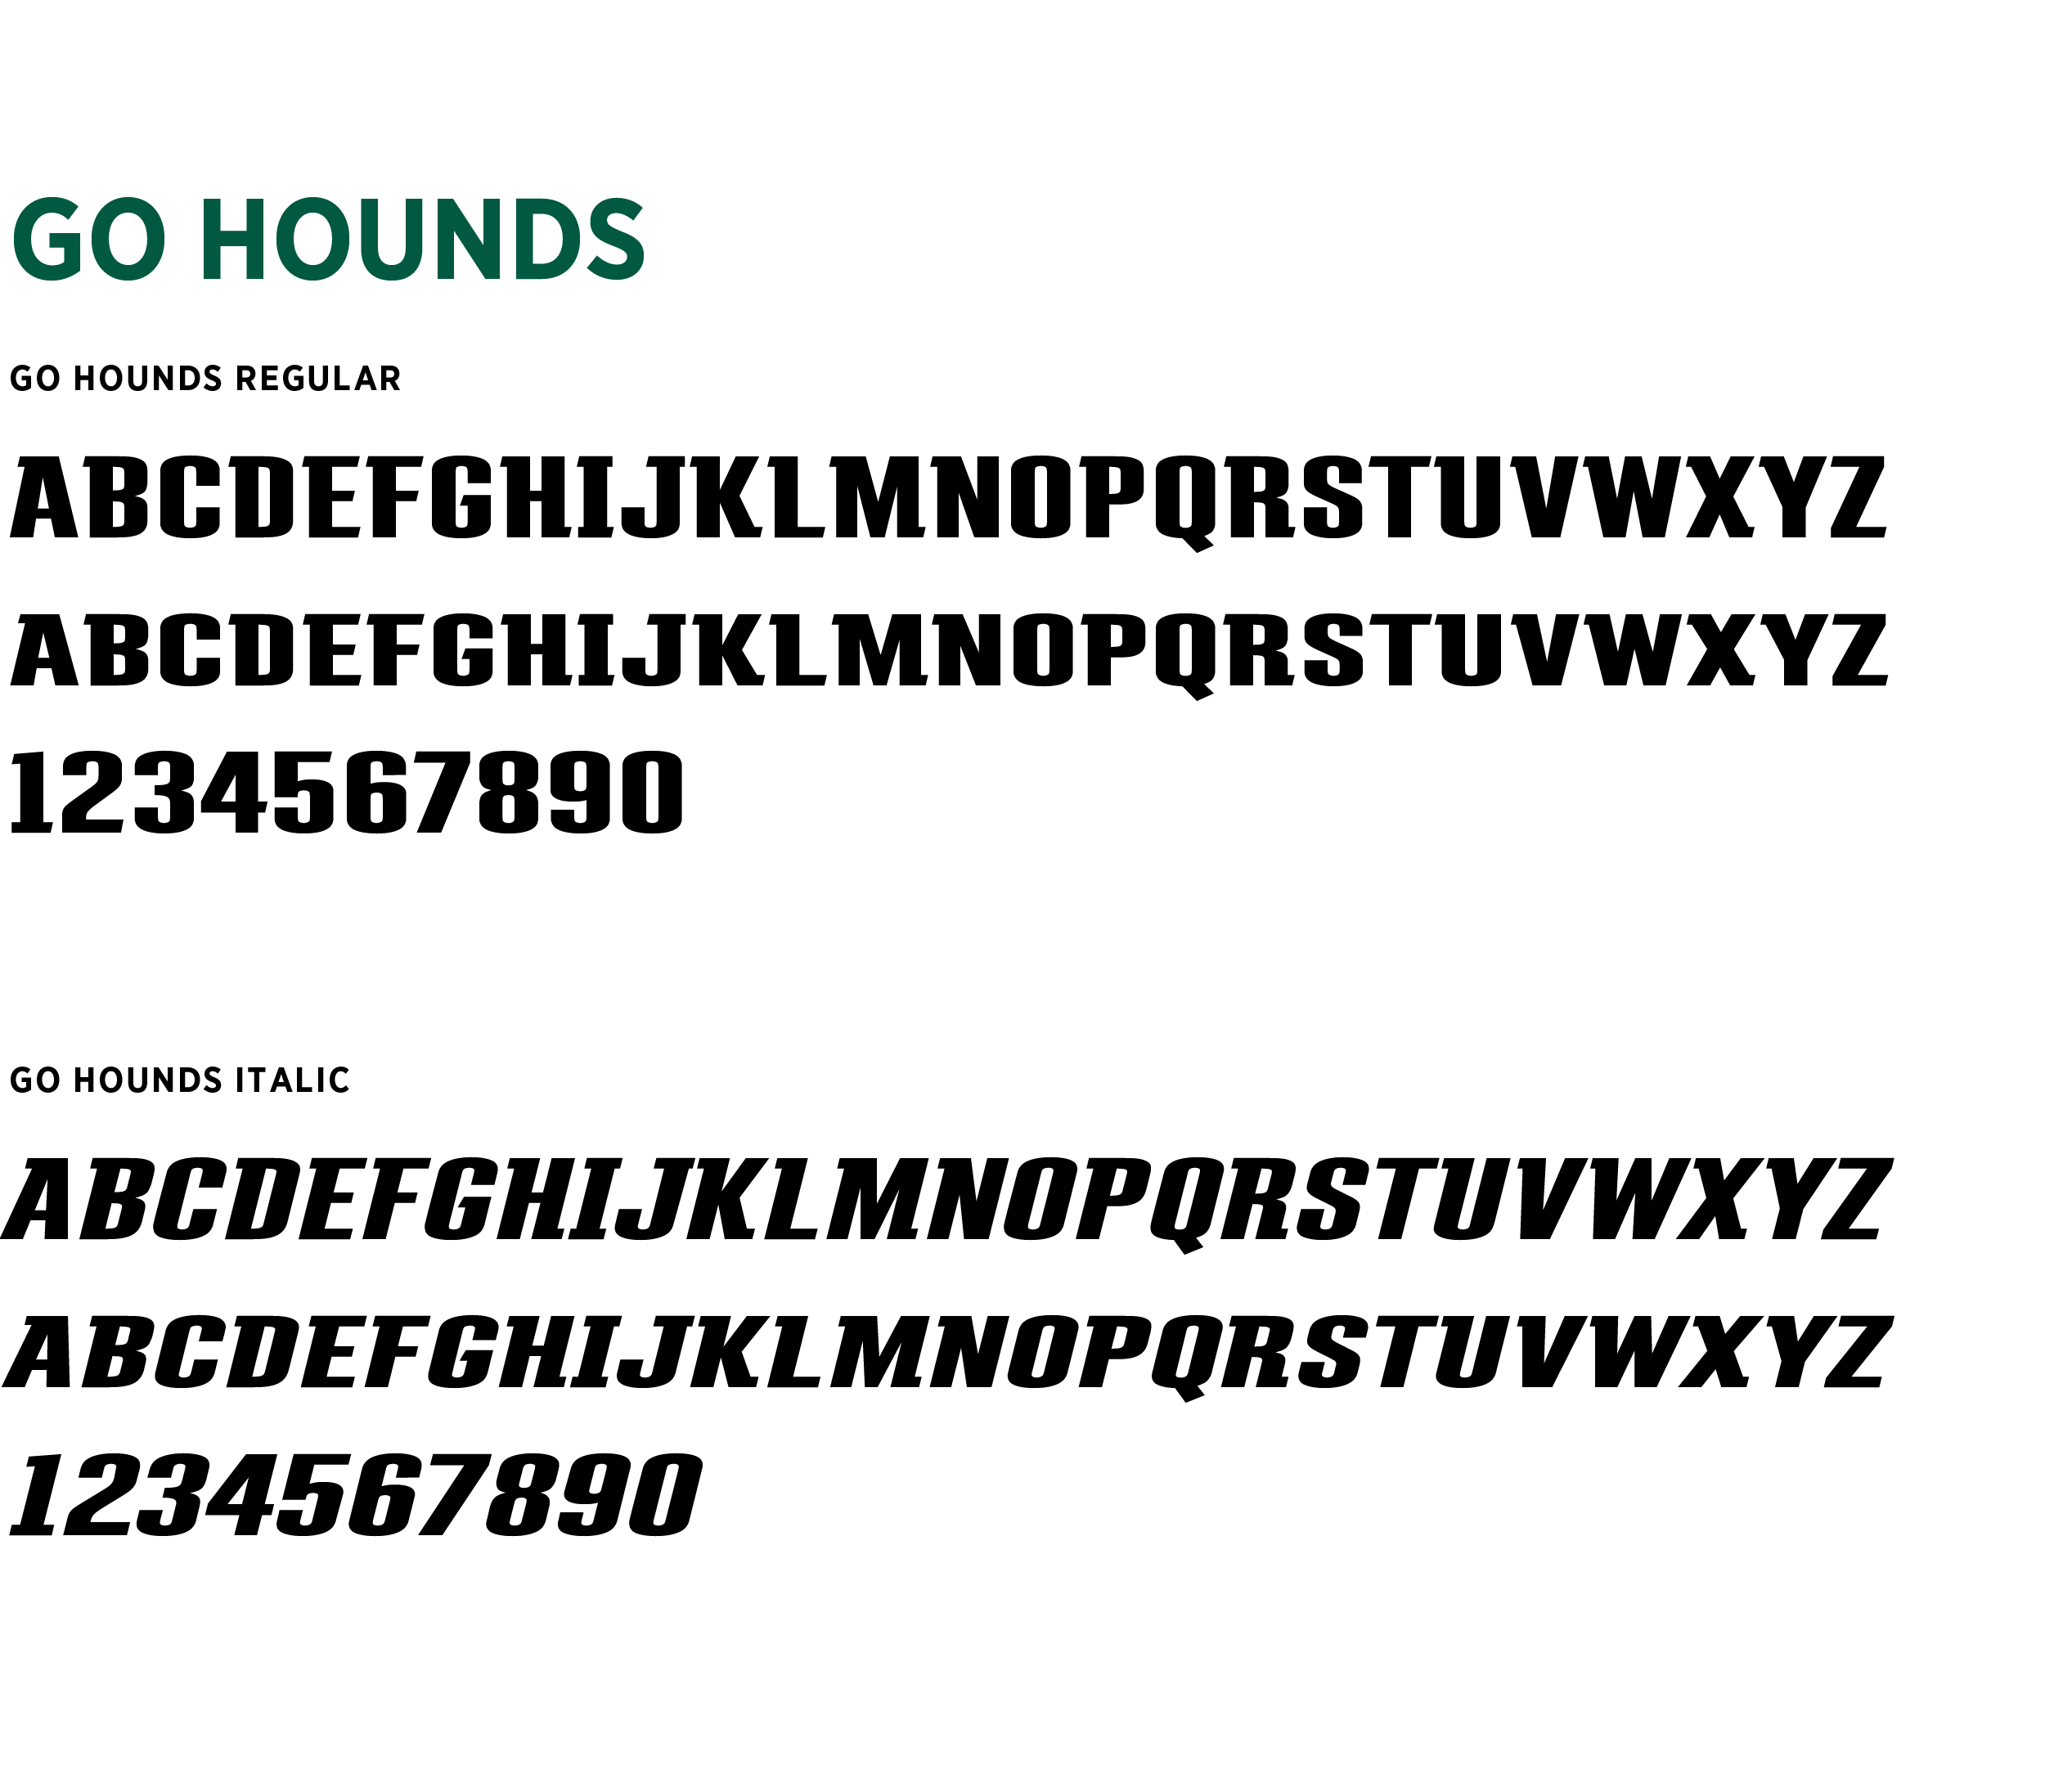 Loyola_Greyhounds_BrandFonts1.png